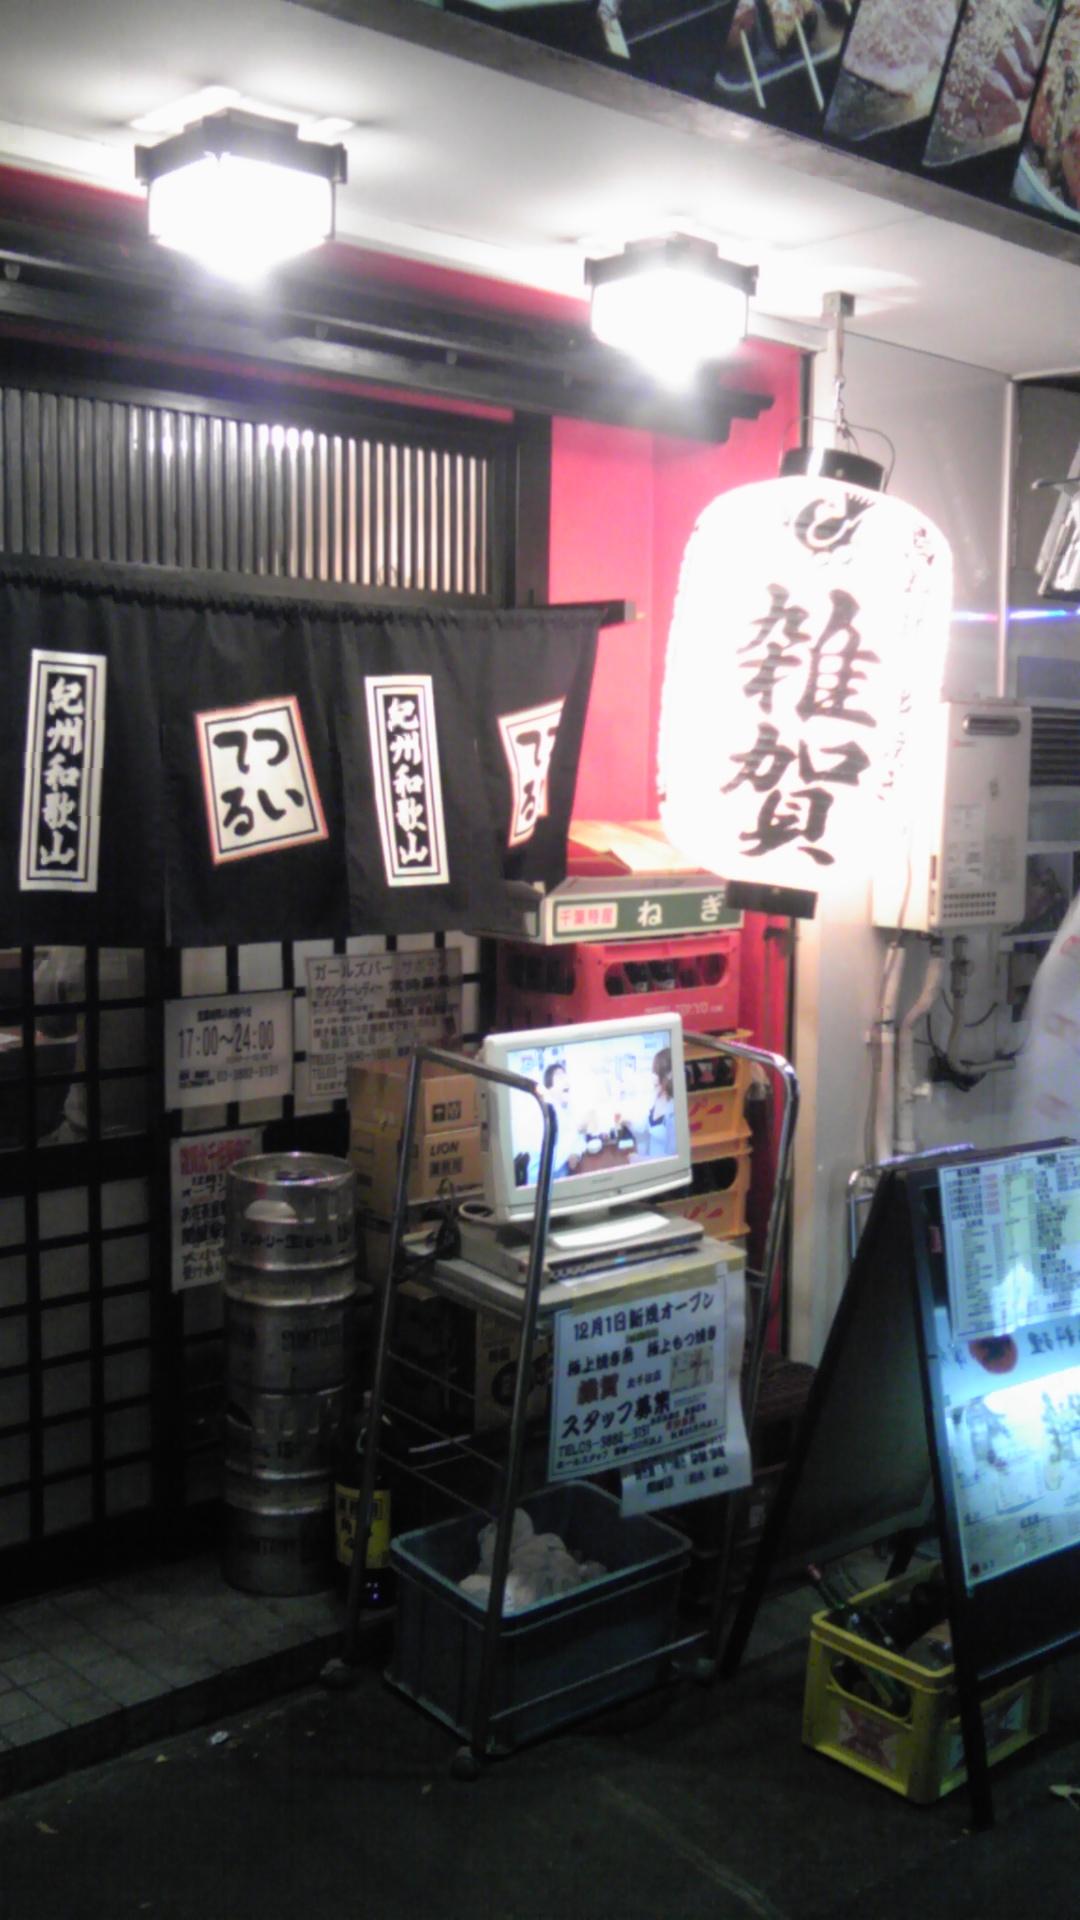 極上焼鳥 極上もつ焼き 雑賀 関屋駅前店